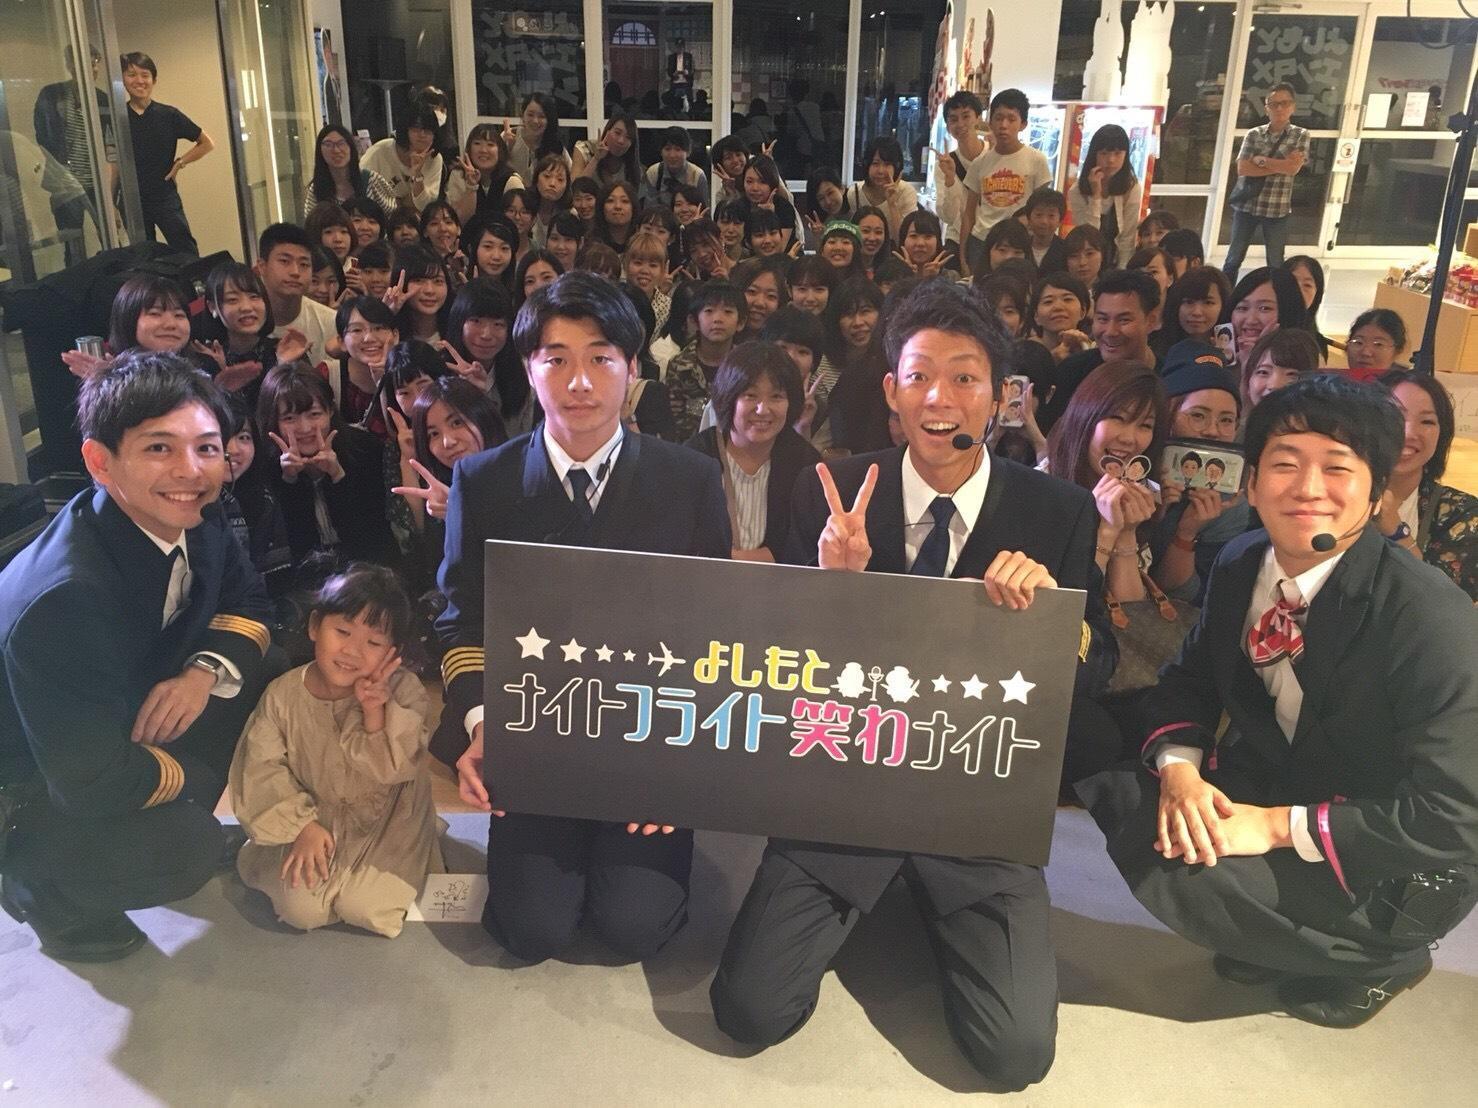 http://news.yoshimoto.co.jp/20181010201908-5815935a911bdd5d907da38ec36f8795ba198709.jpg